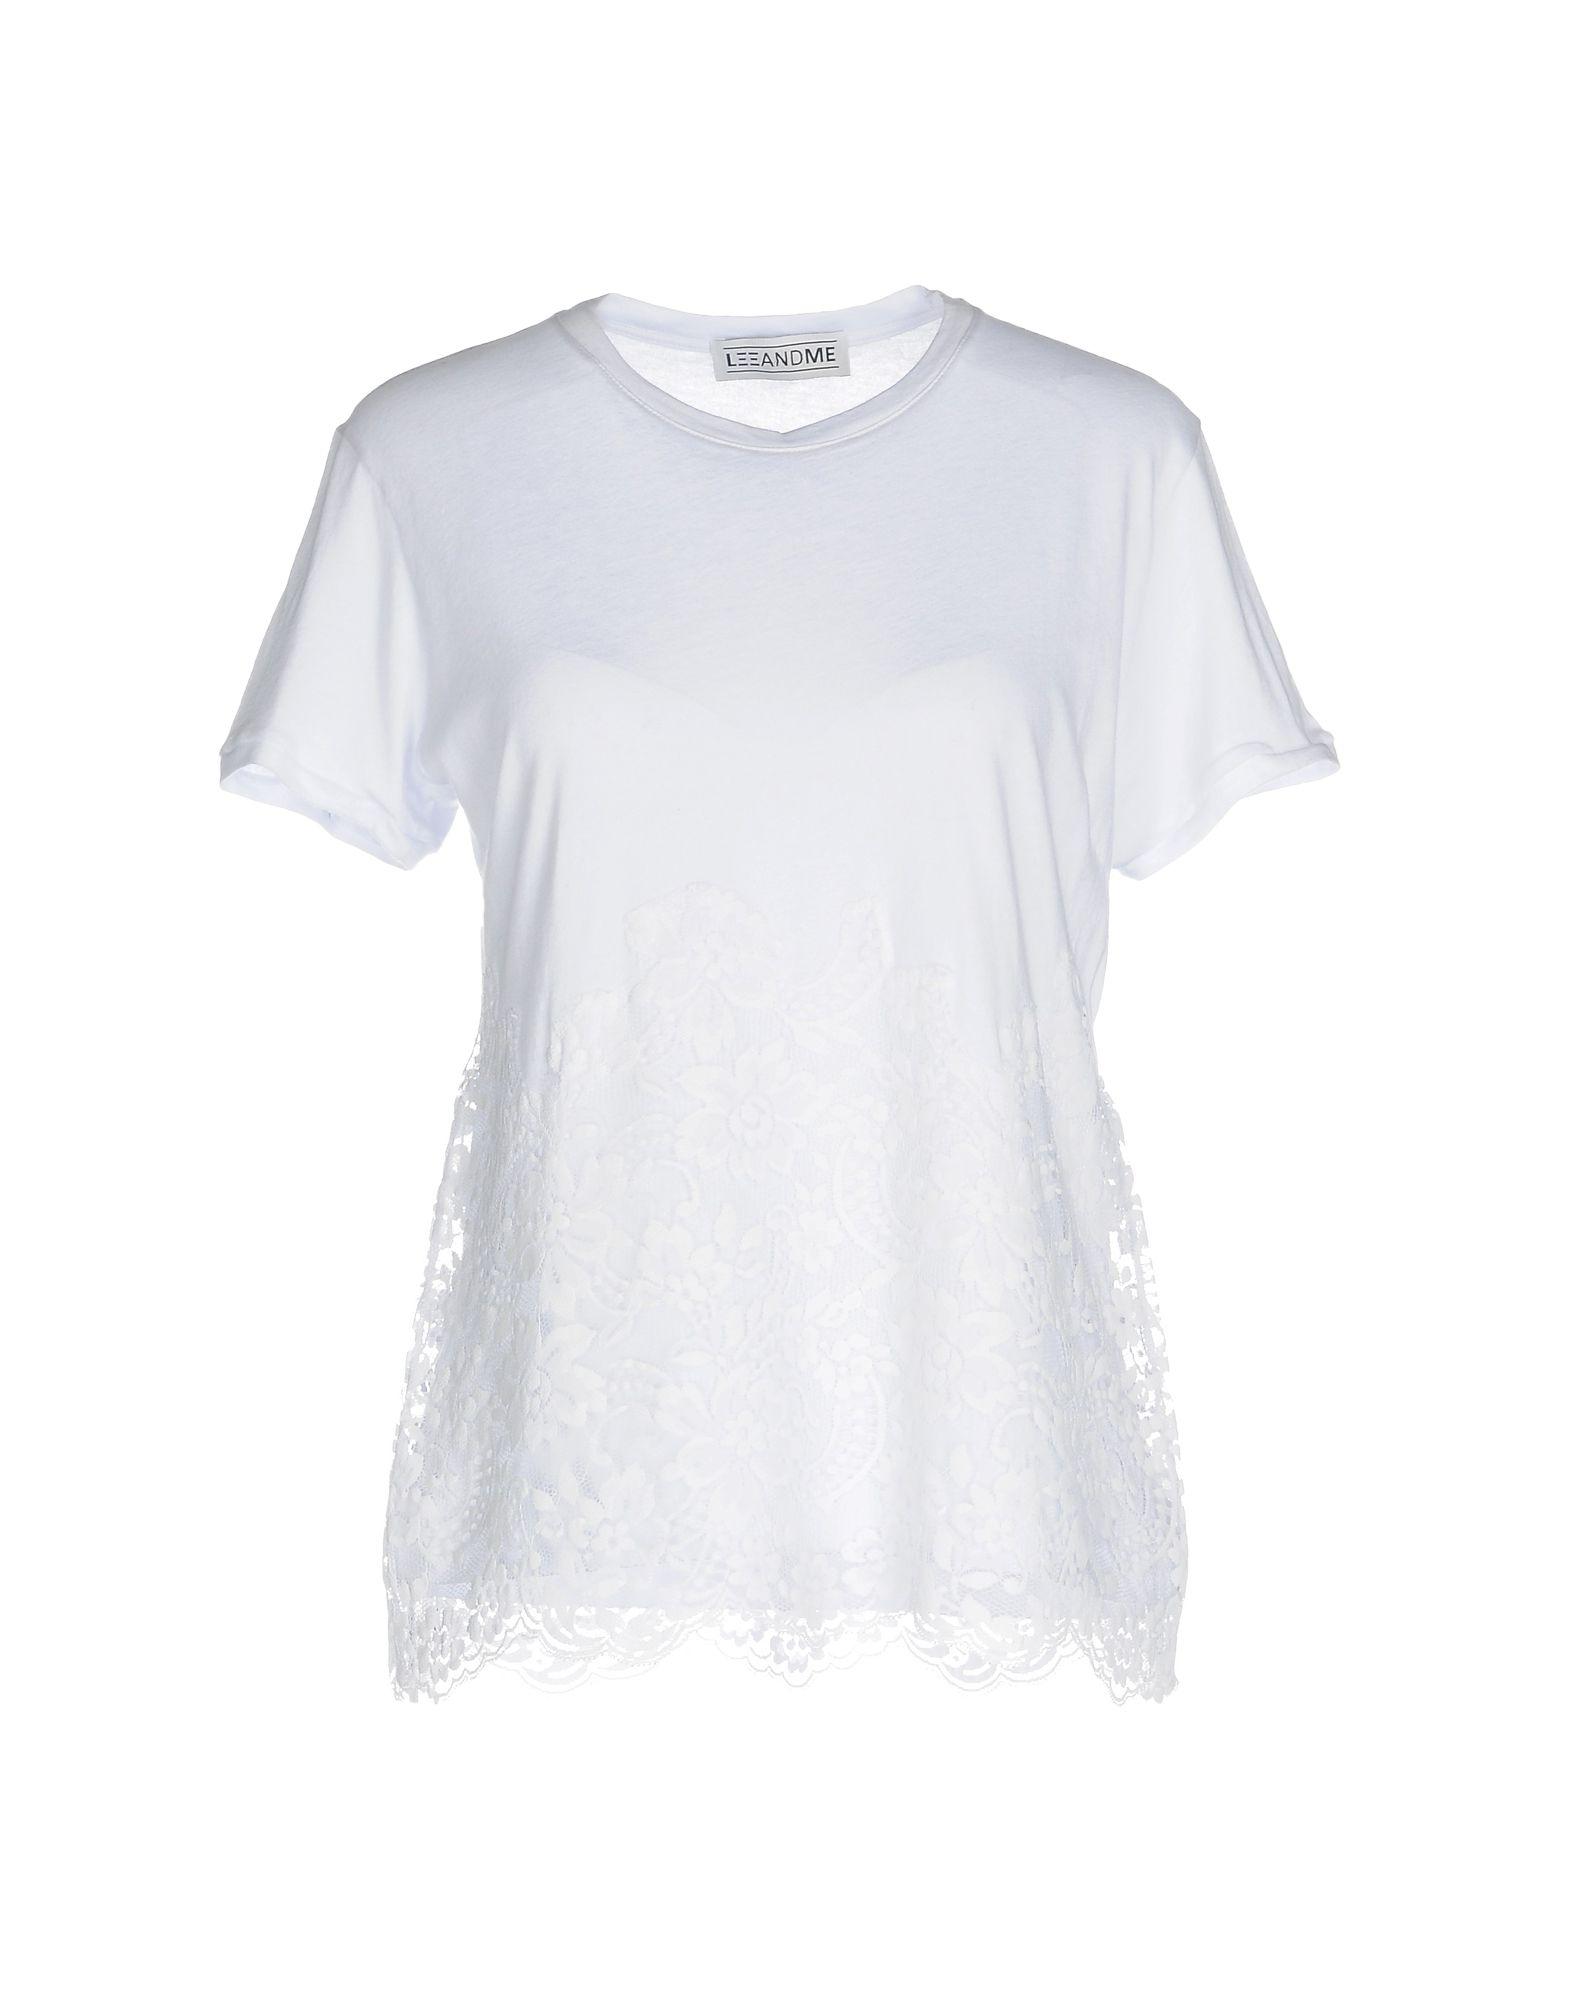 LEE AND ME Футболка футболка для беременных printio мишка me to you